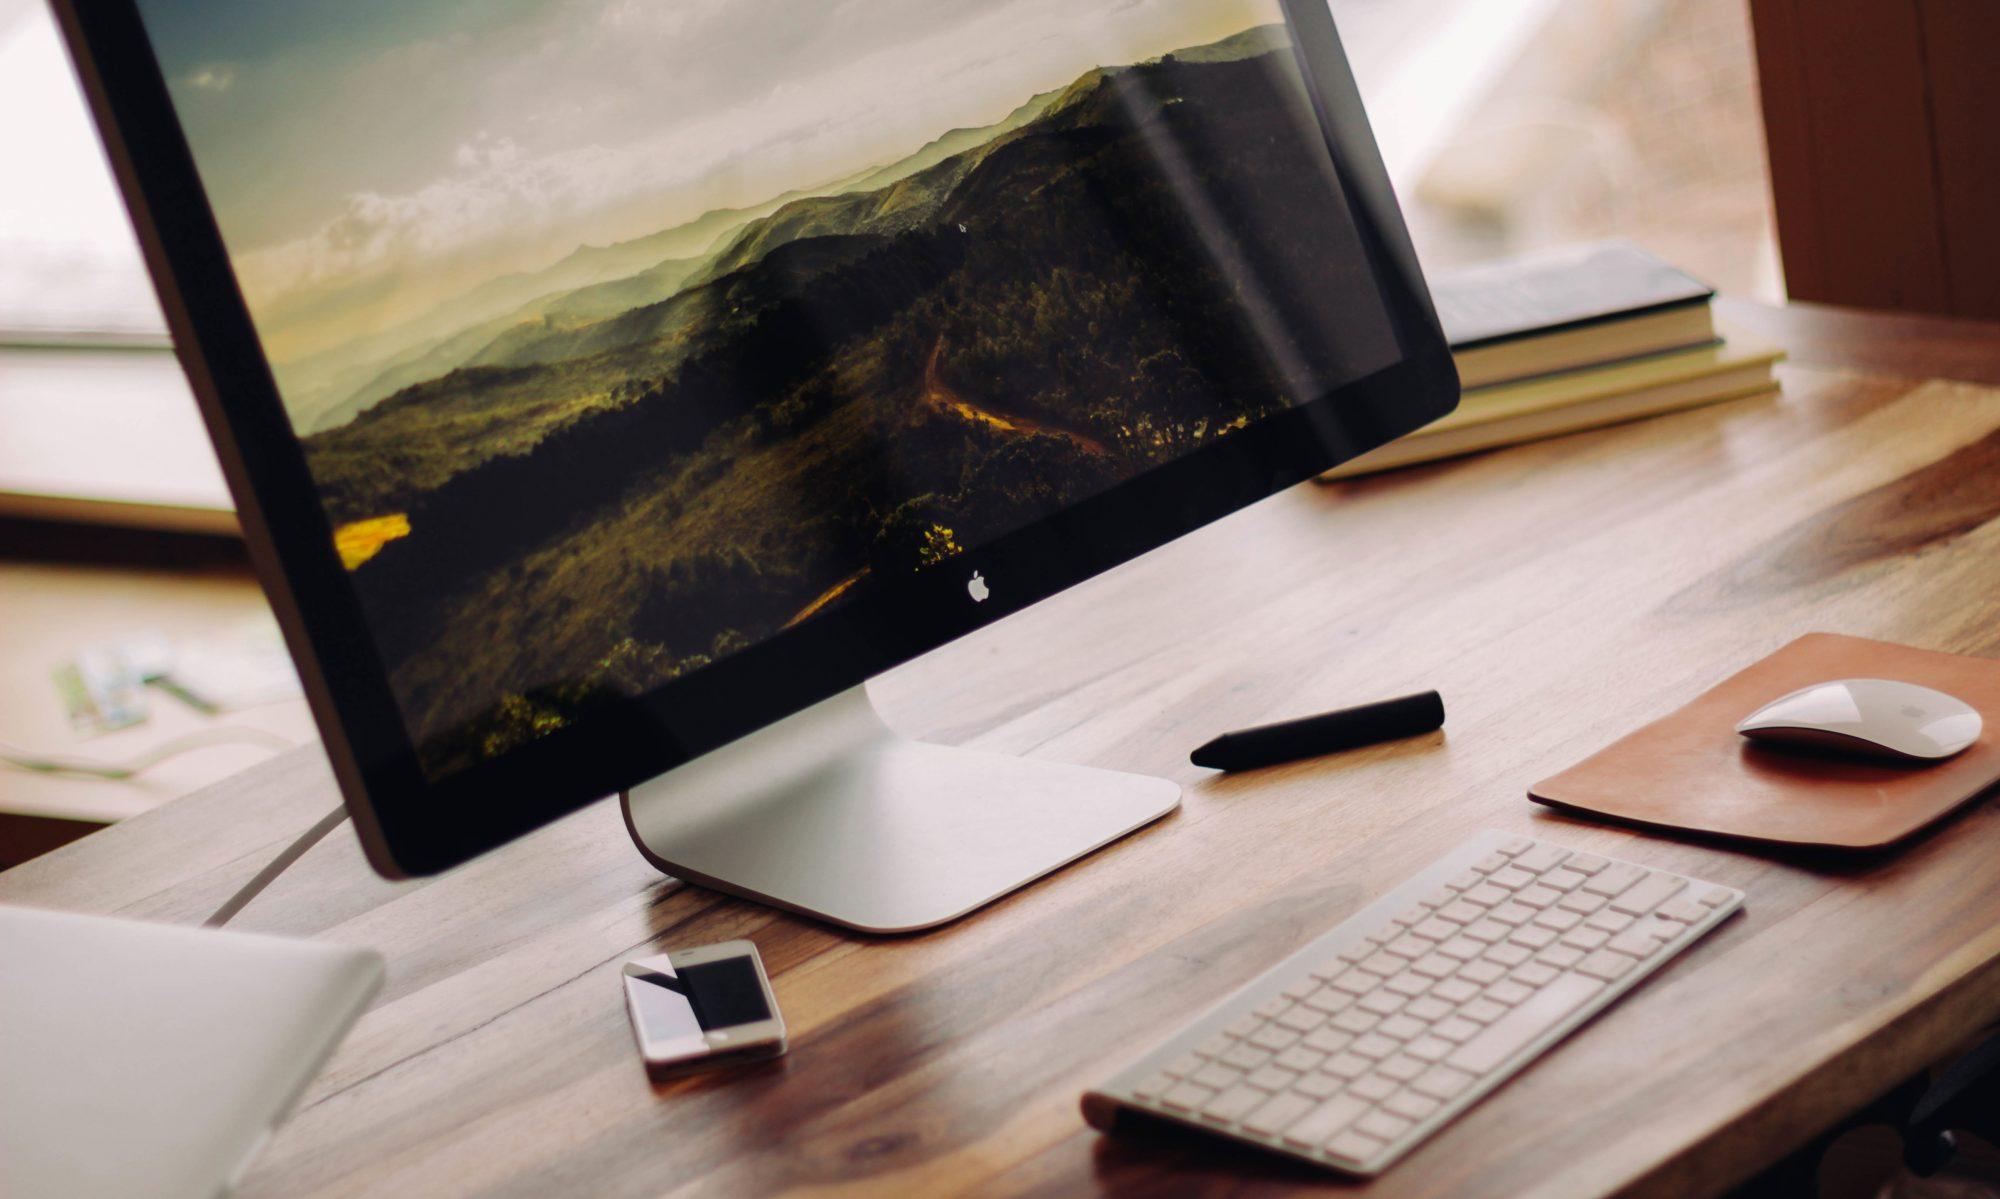 Fones and Computing